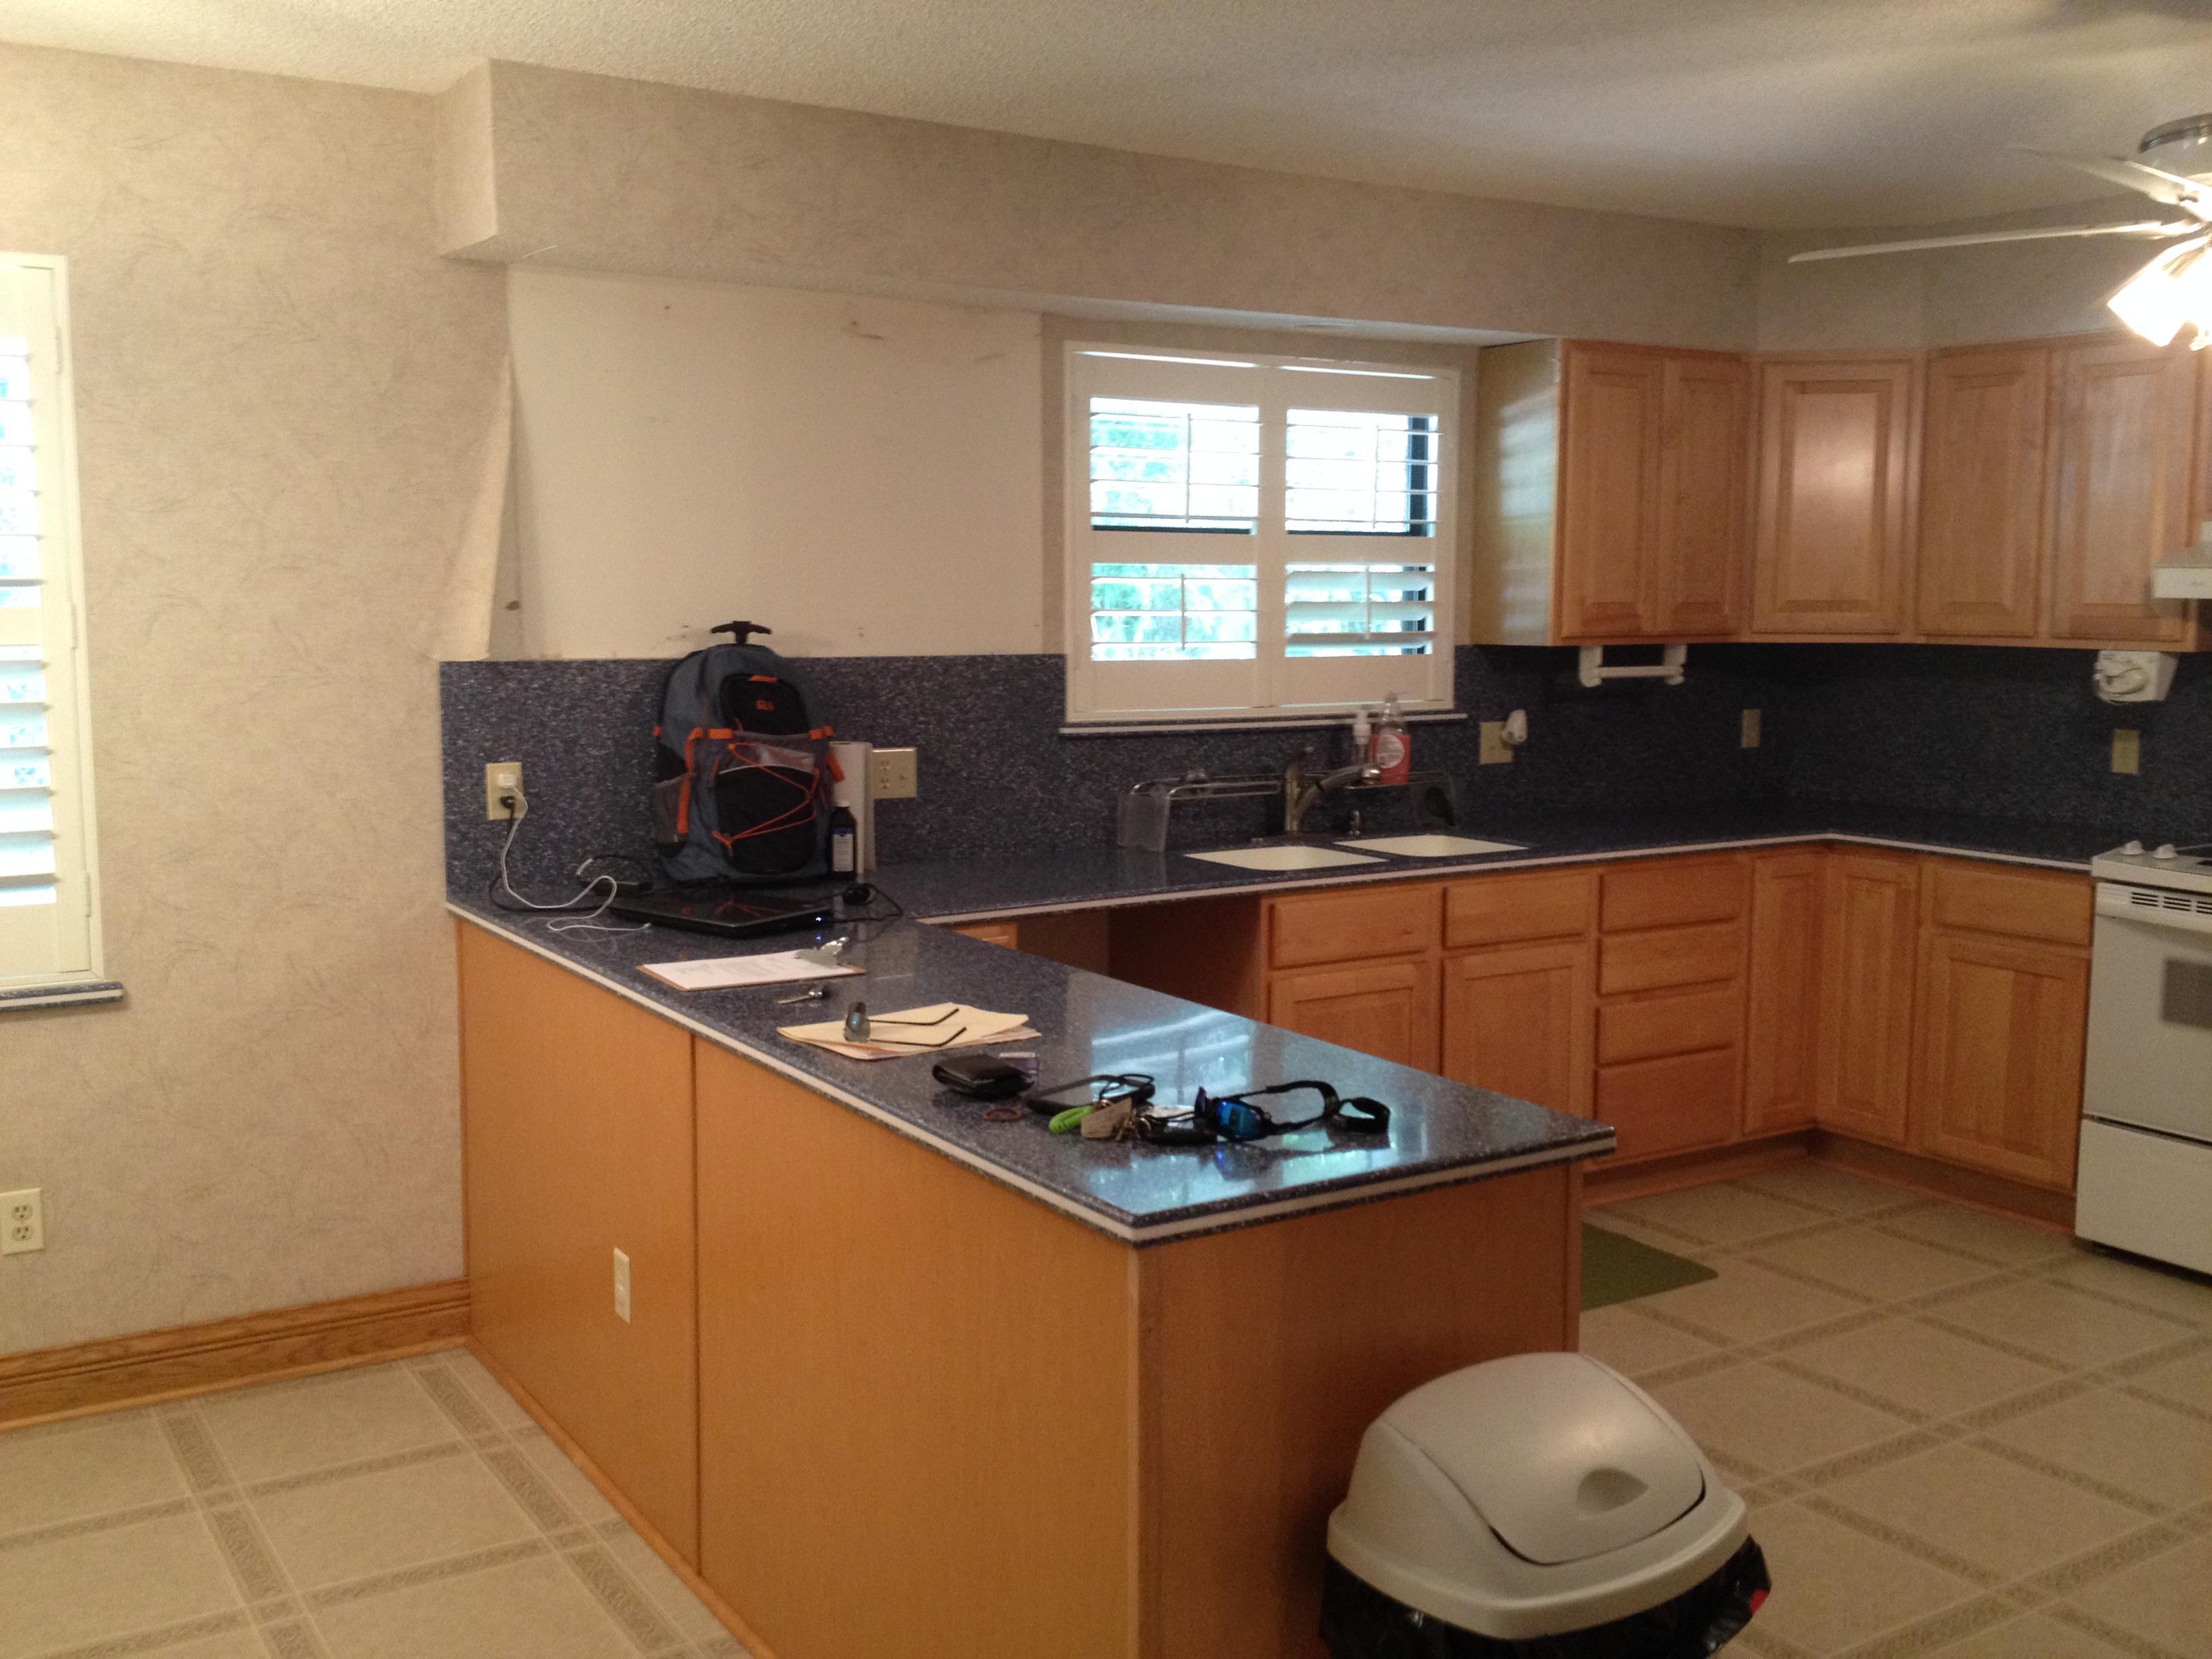 dreambuilder 23 a s kitchen renovation is complete kitchen remodel jacksonville fl Before